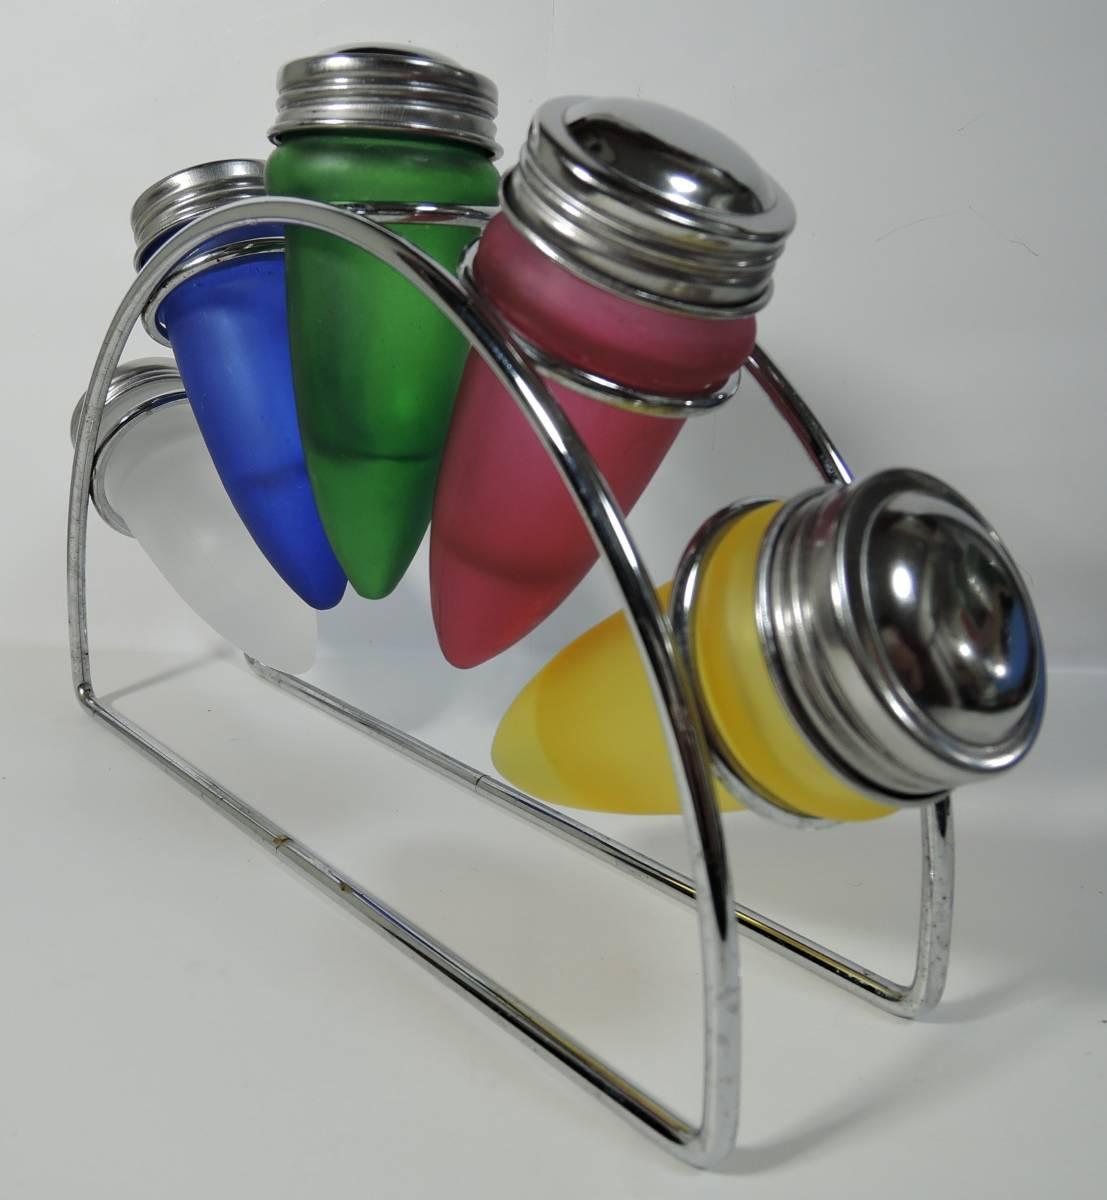 Y03■昭和レトロ カラフルガラス瓶 調味料入 ラック付■_画像2